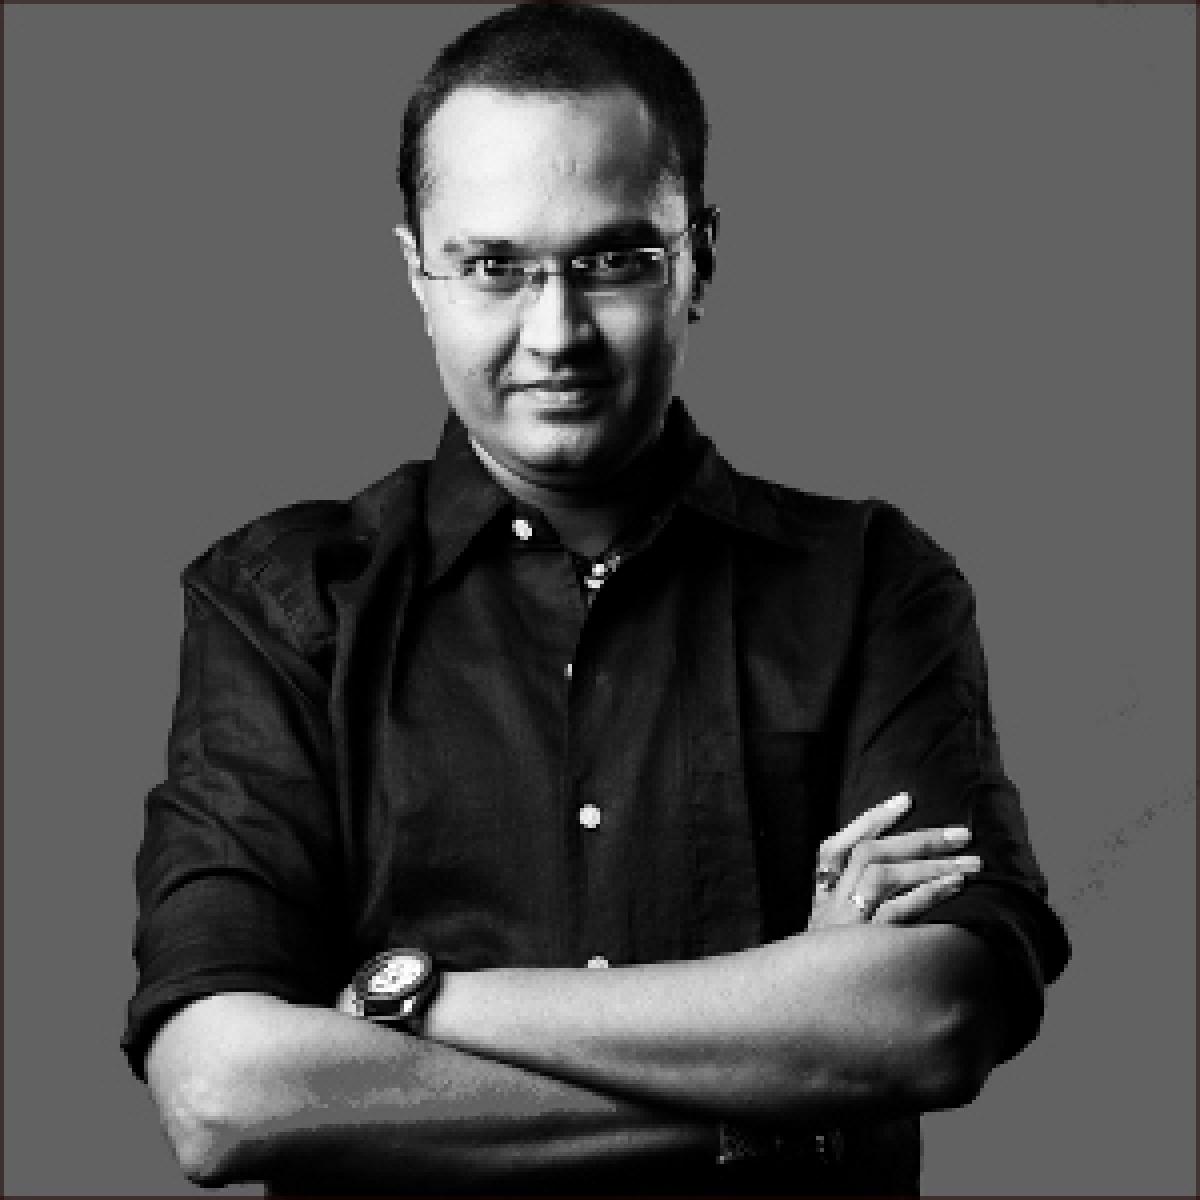 Pranav Harihar Sharma quits Rediffusion Y&R